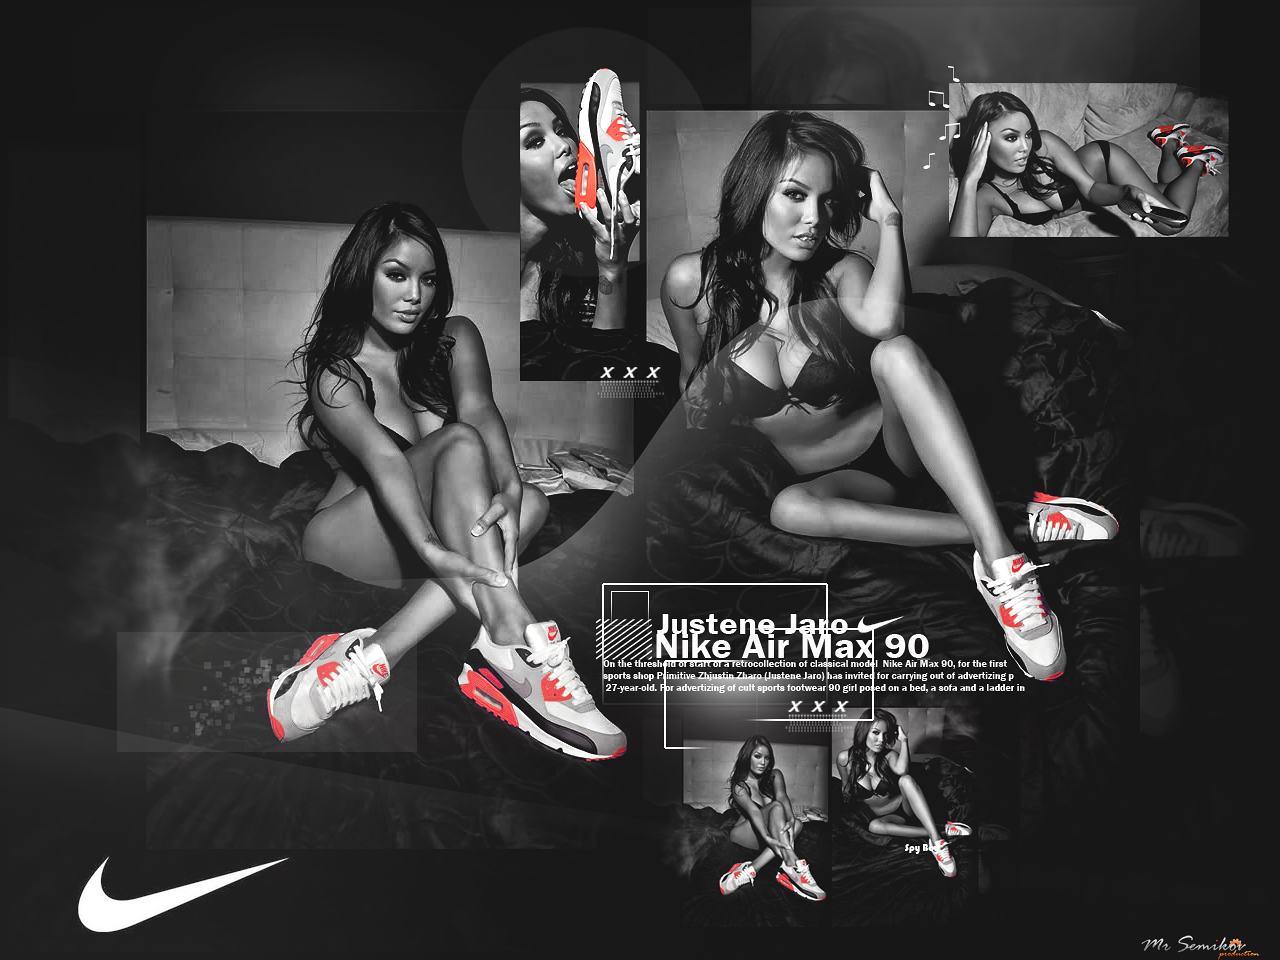 verbo Apéndice absceso  Justene Jaro Nike Air Max 90 by SoccerGFX-Clips-ru on DeviantArt